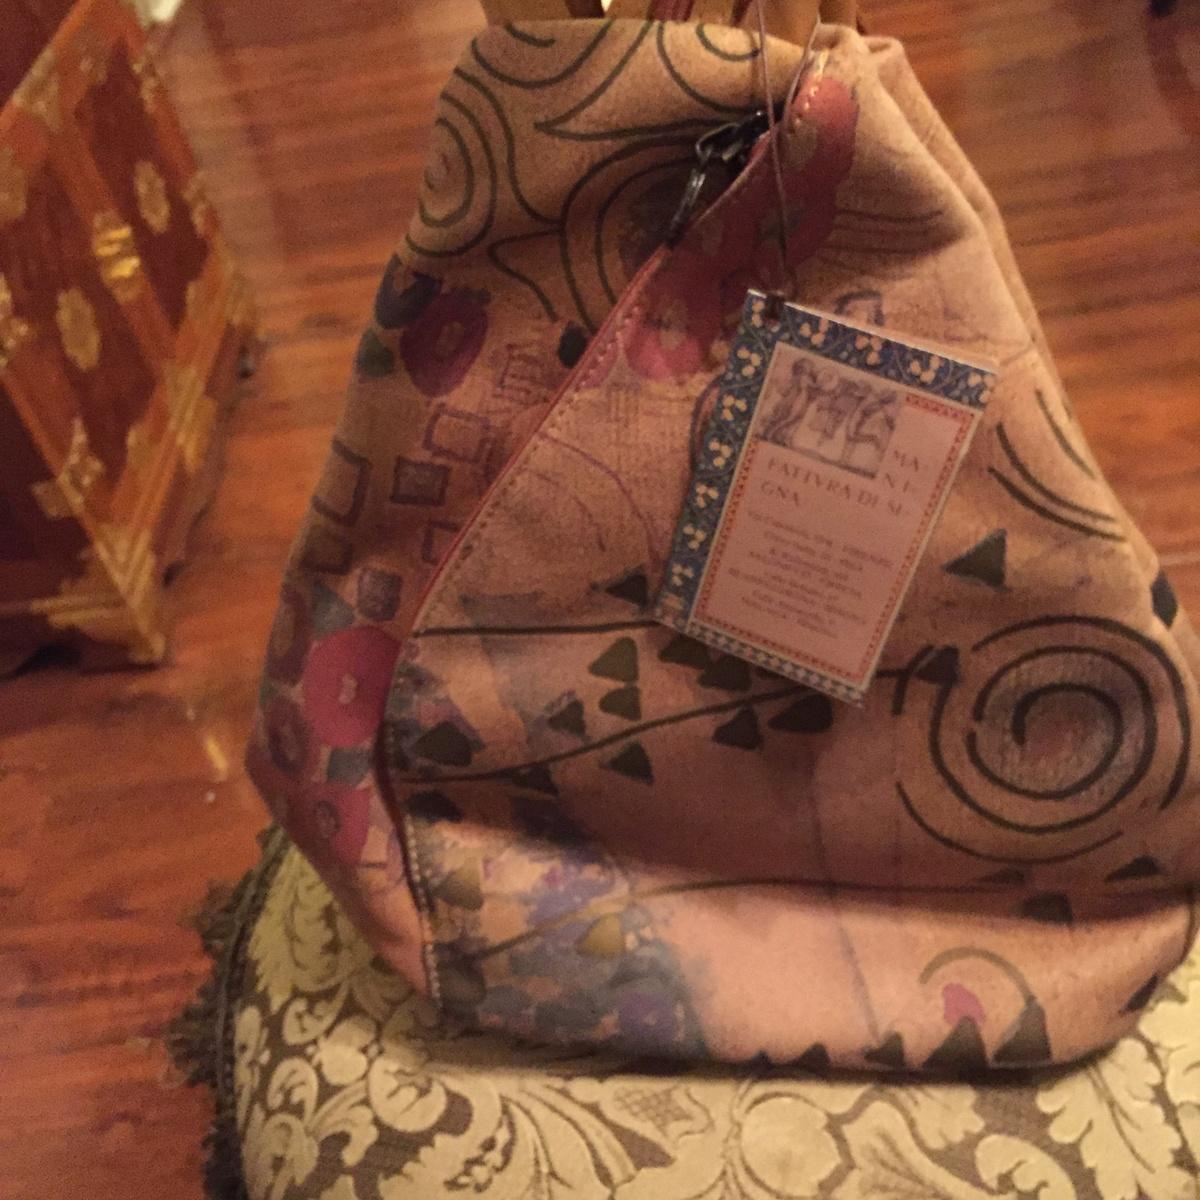 Manifattura di Signa Backpack/Purse | Collectors Weekly